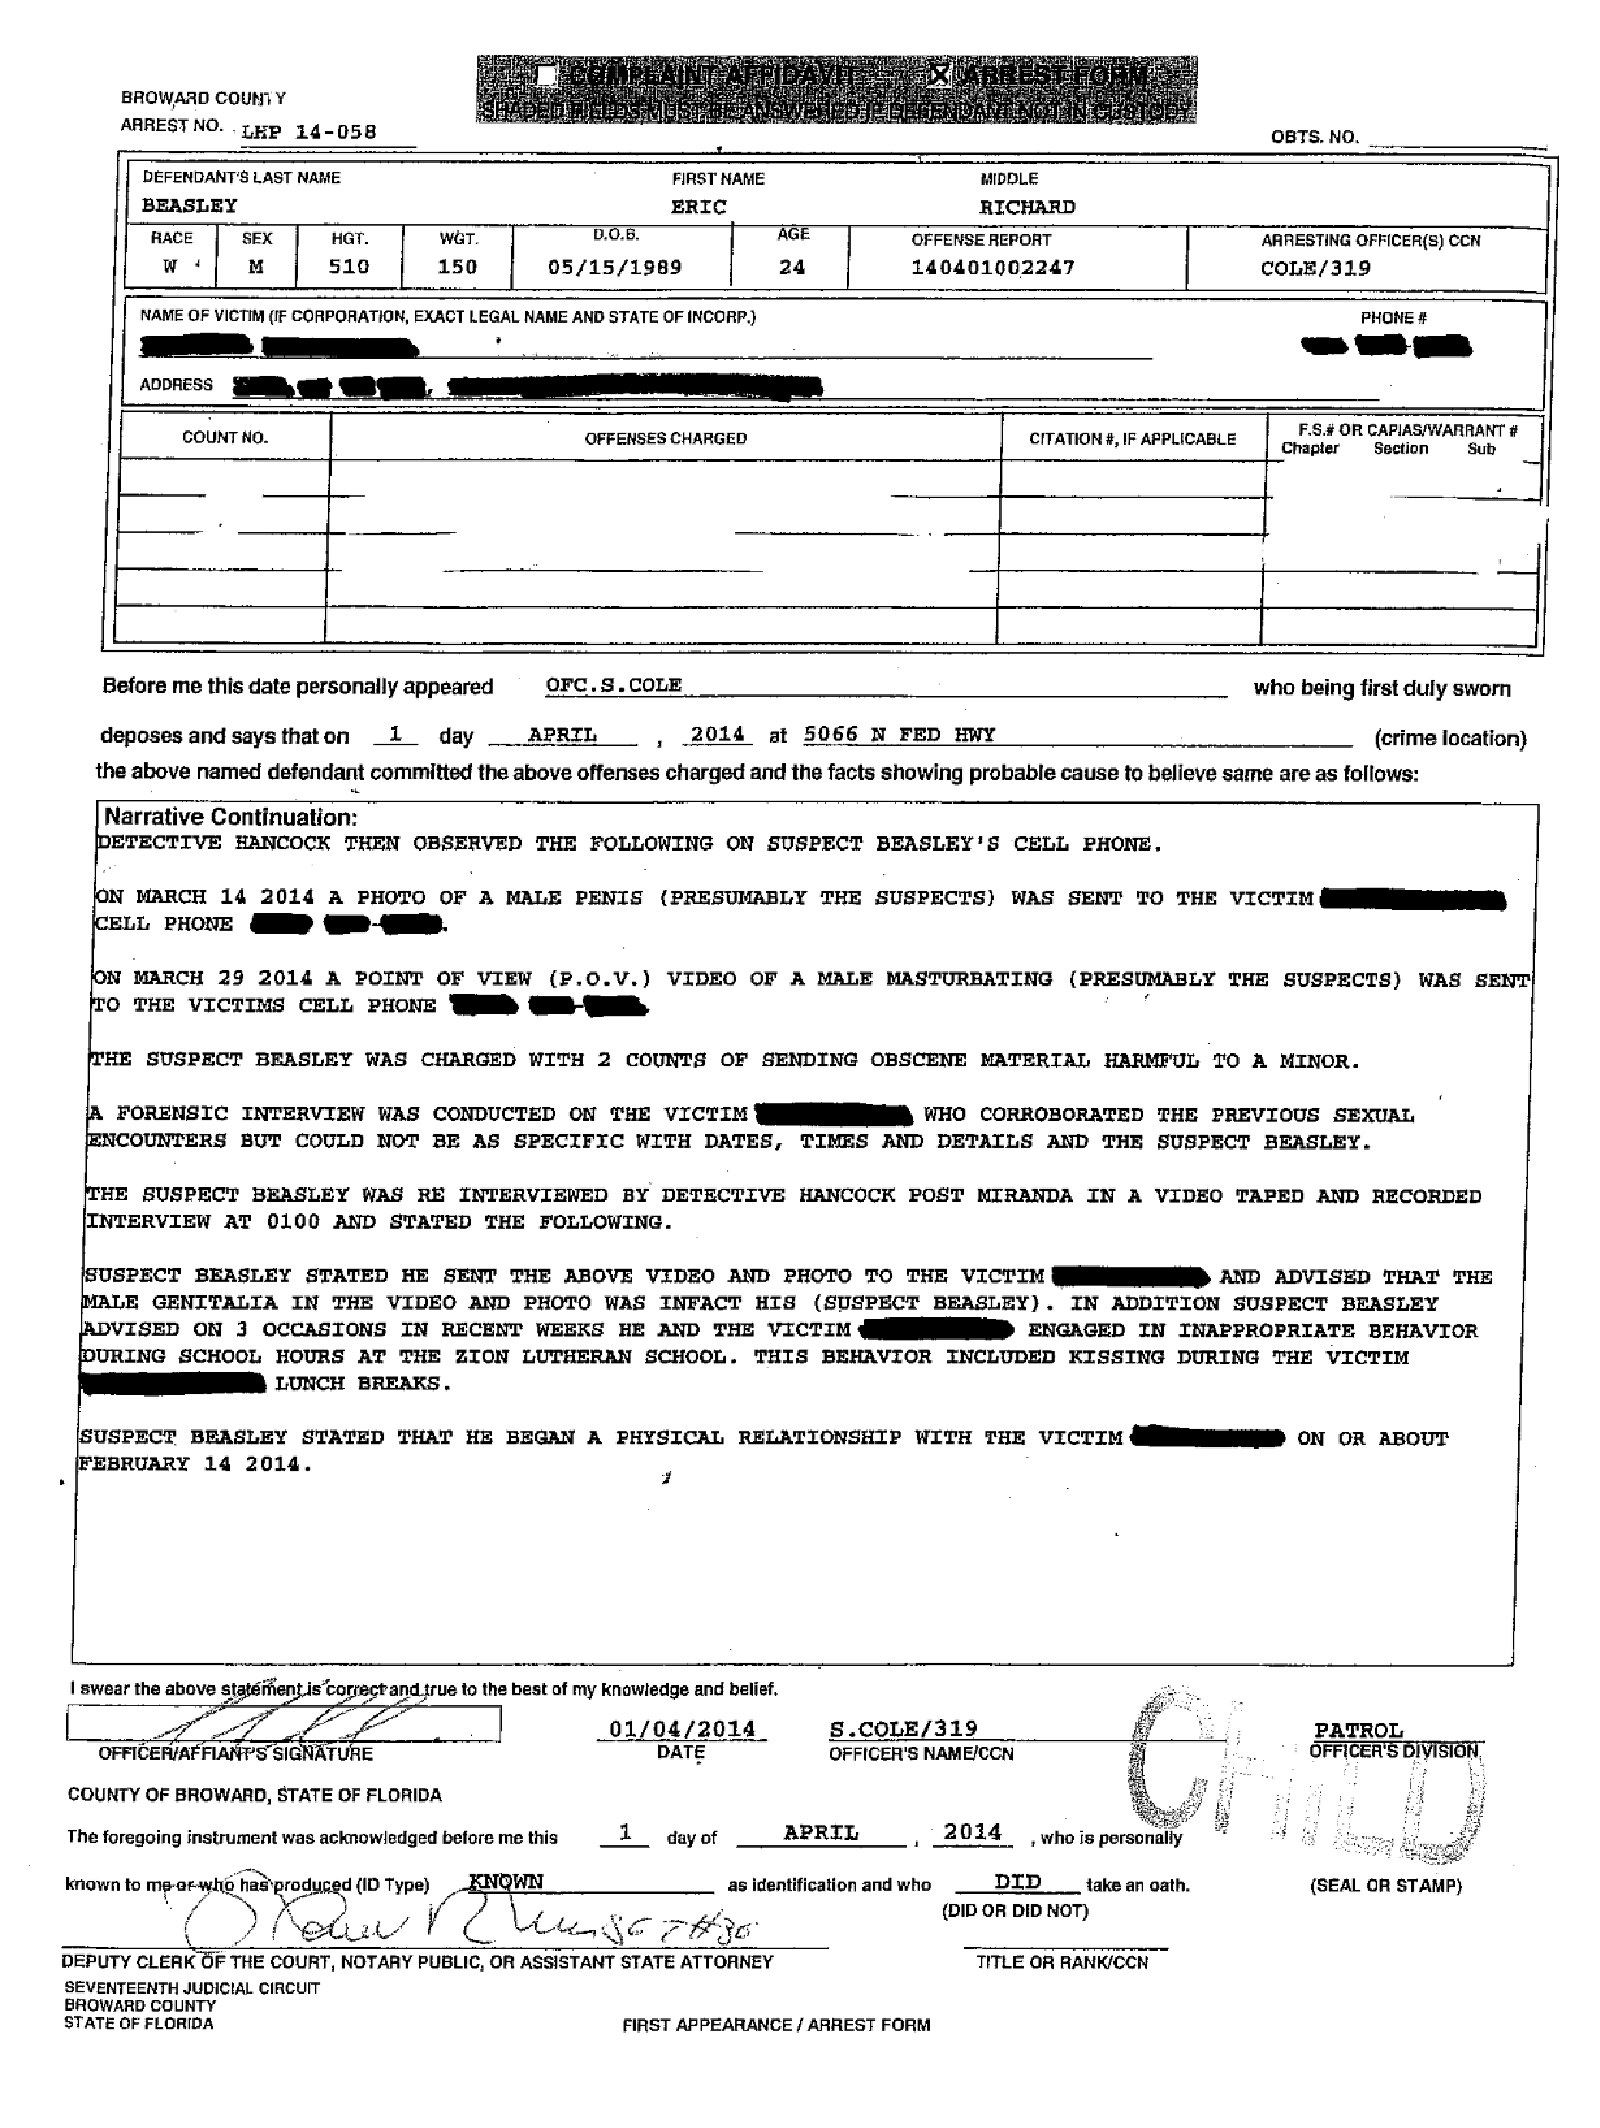 Copy of Beasley Eric arrest affidavit4.png